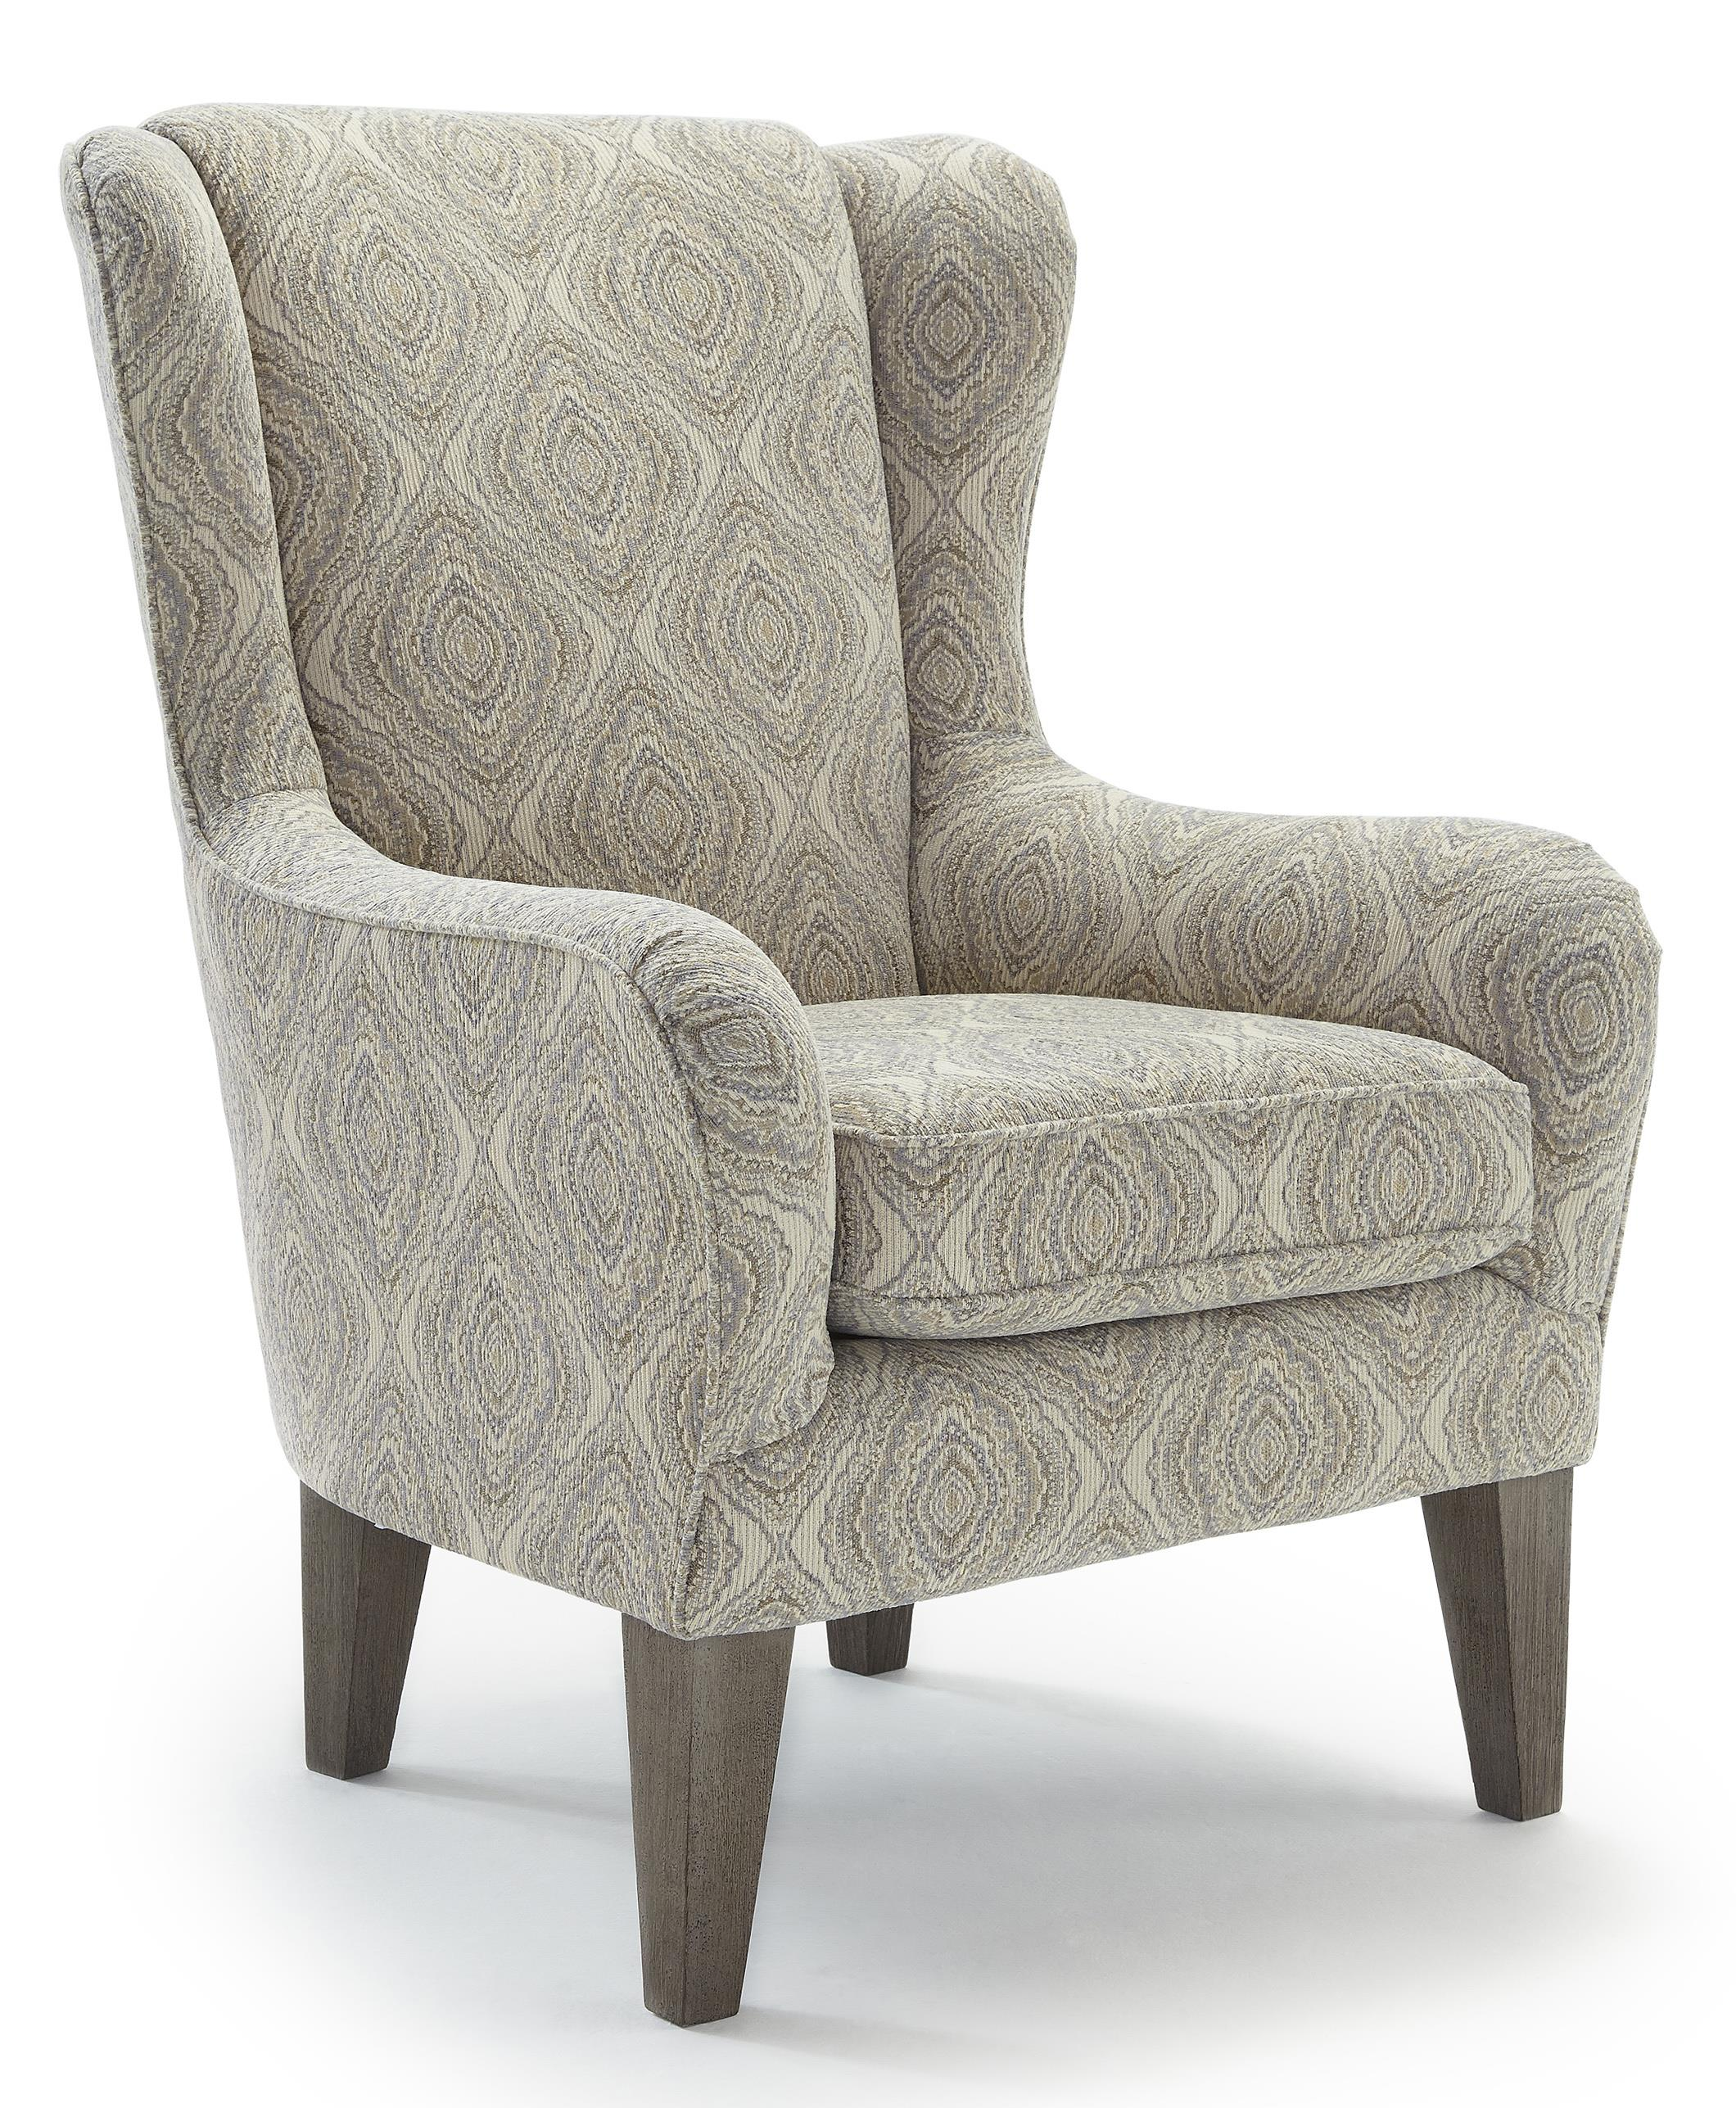 Best Home Furnishings Chairs Club Lorette Club Chair Hudson s